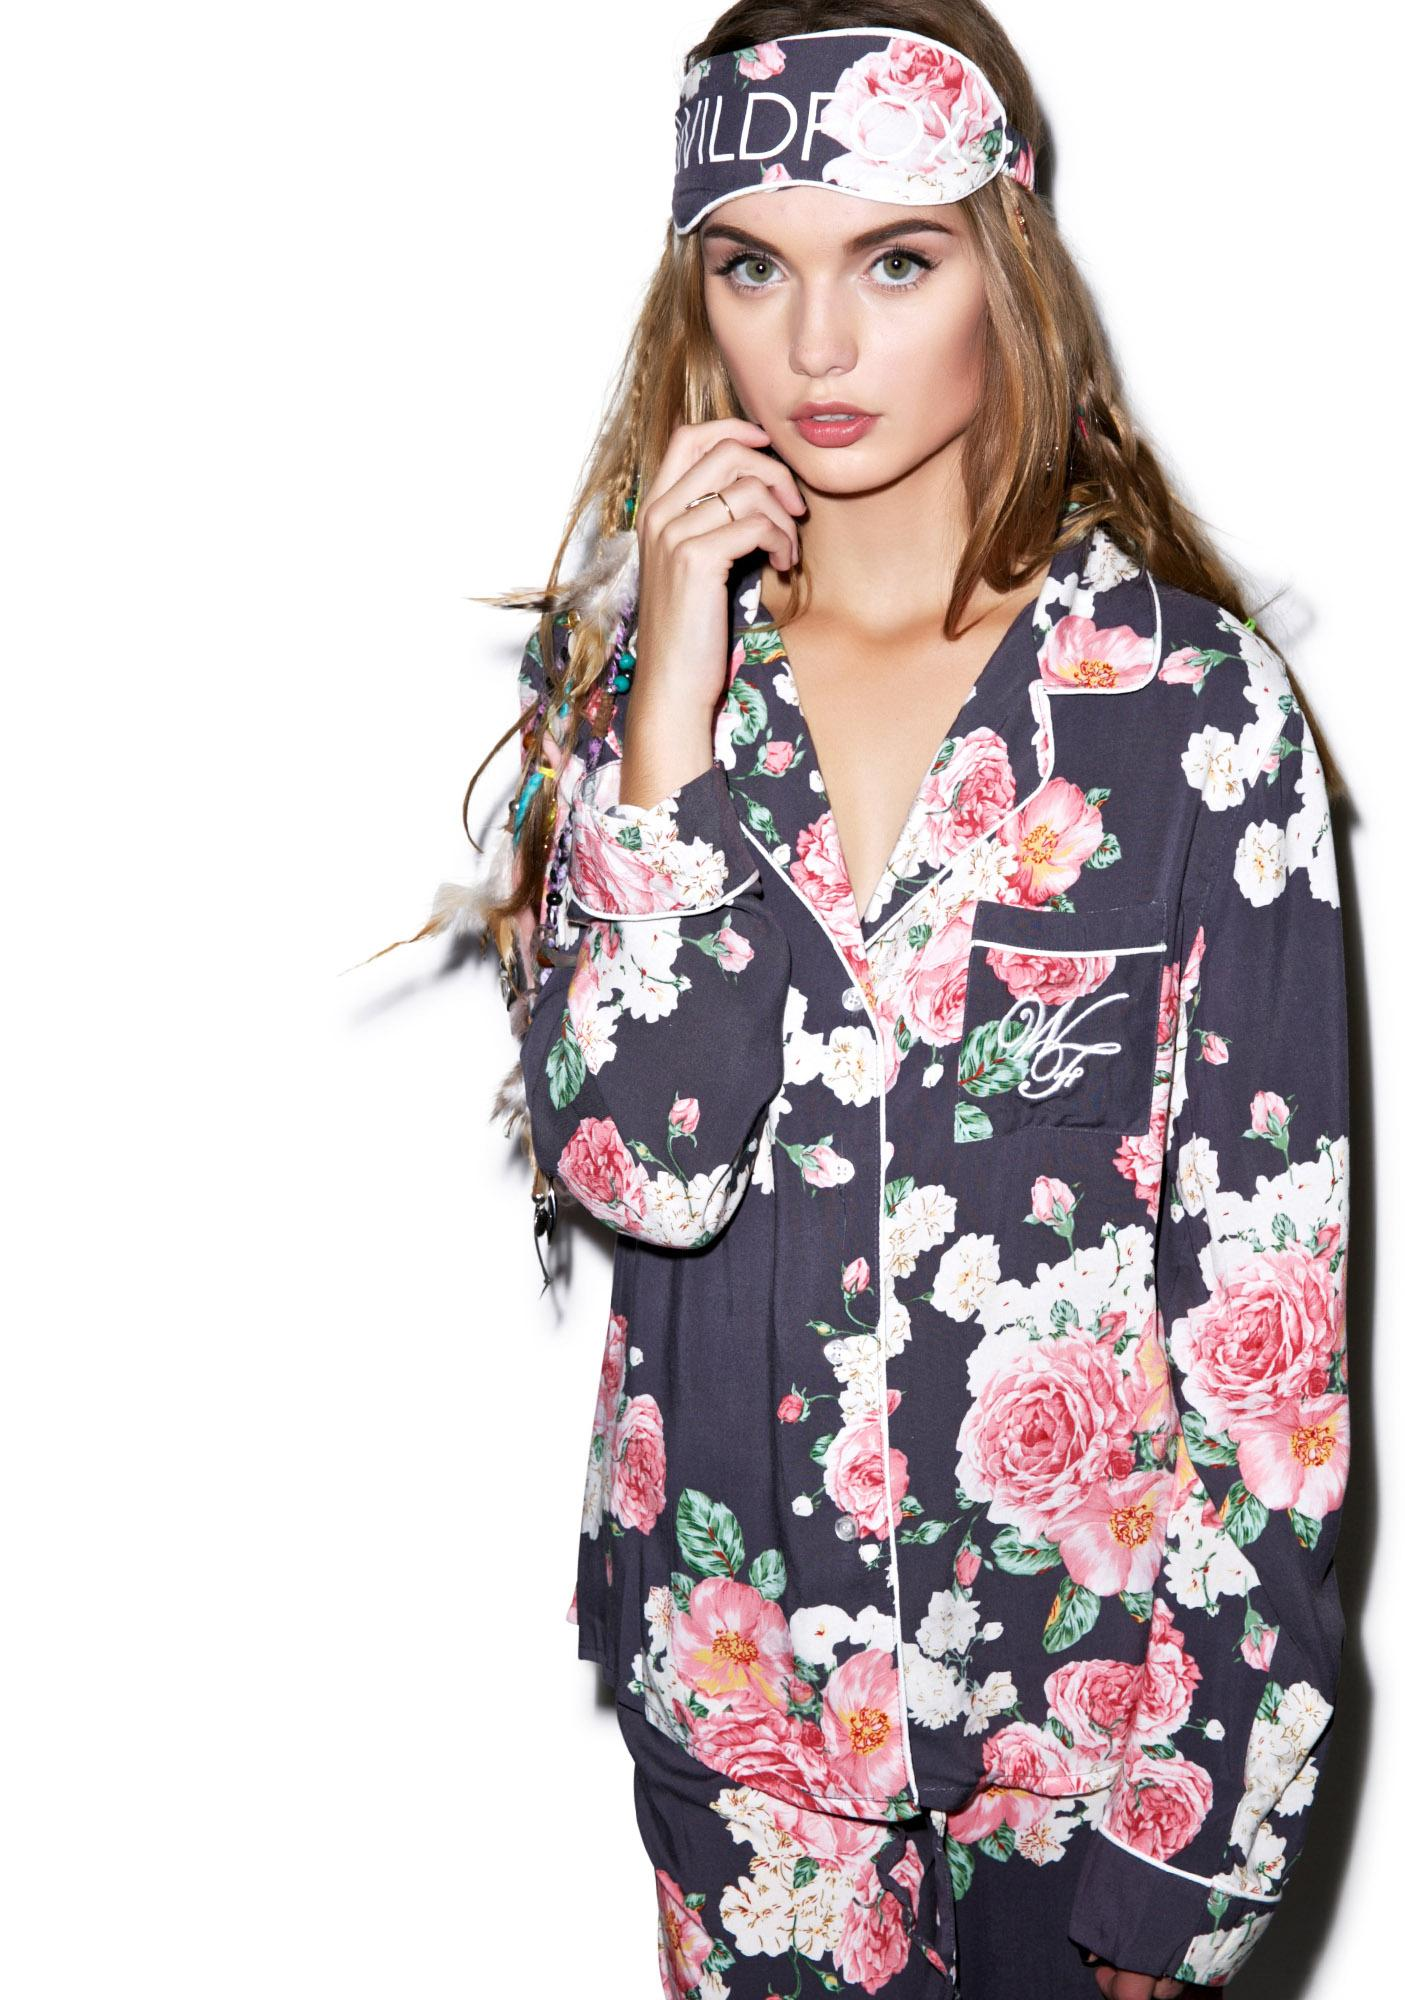 Wildfox Couture Austen Rose Classic PJ Set